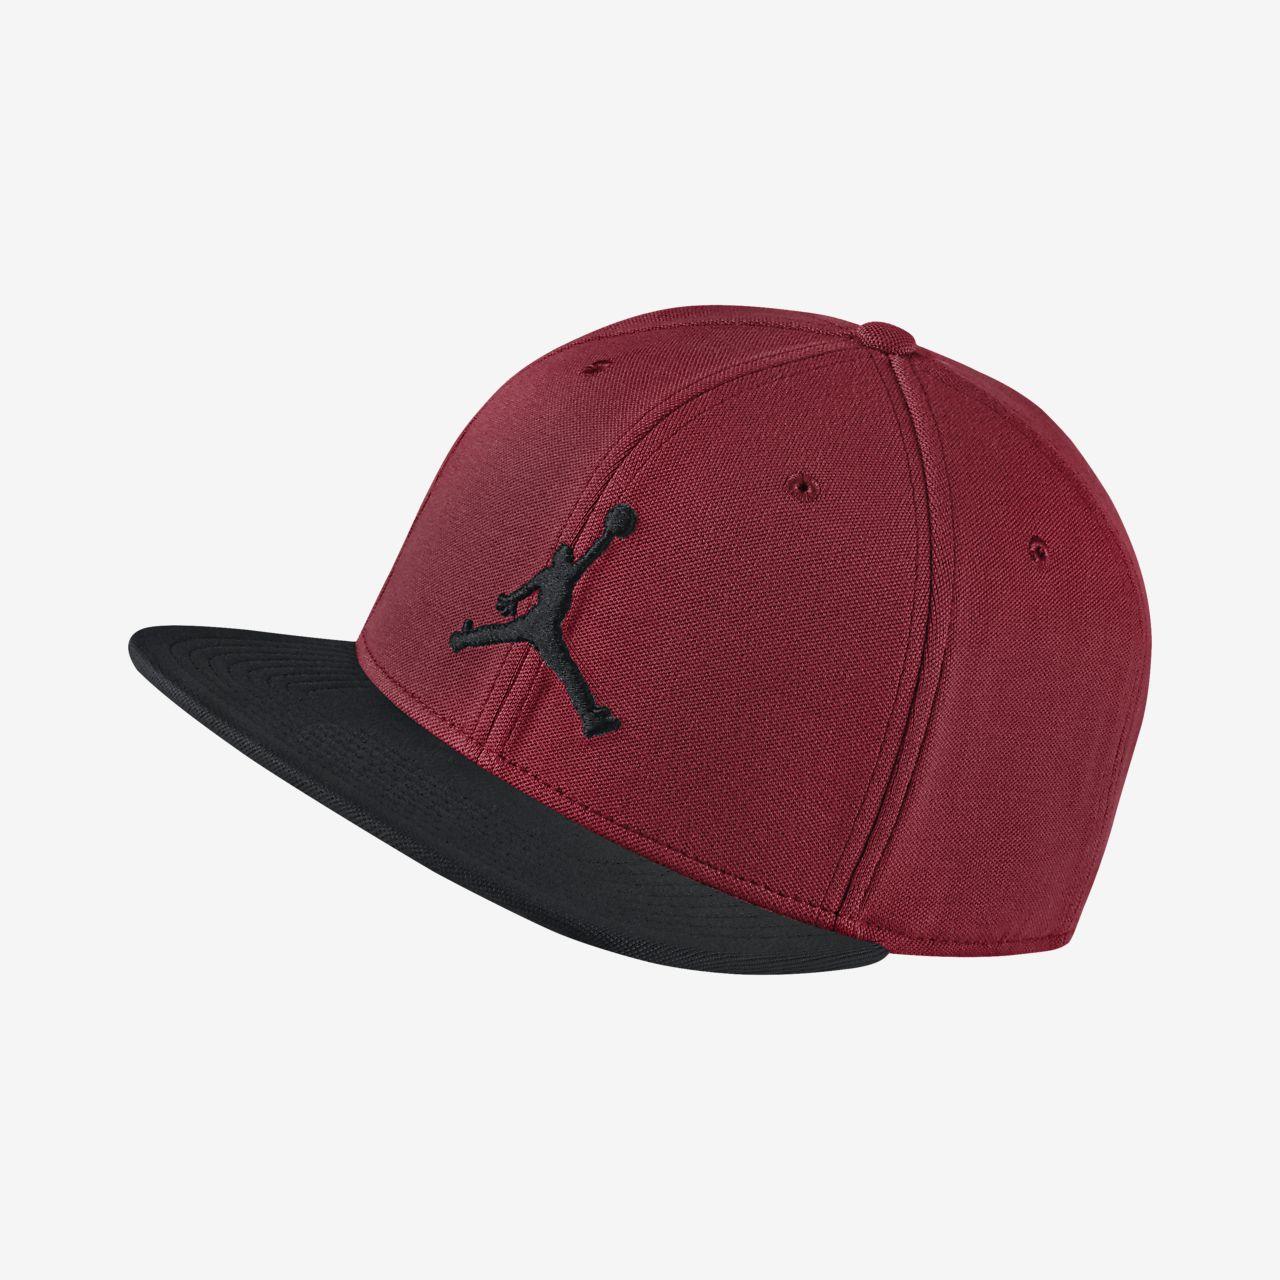 2e4363948e69 ... norway low resolution jordan jumpman snapback adjustable hat jordan  jumpman snapback adjustable hat 9f03f 509a1 ...